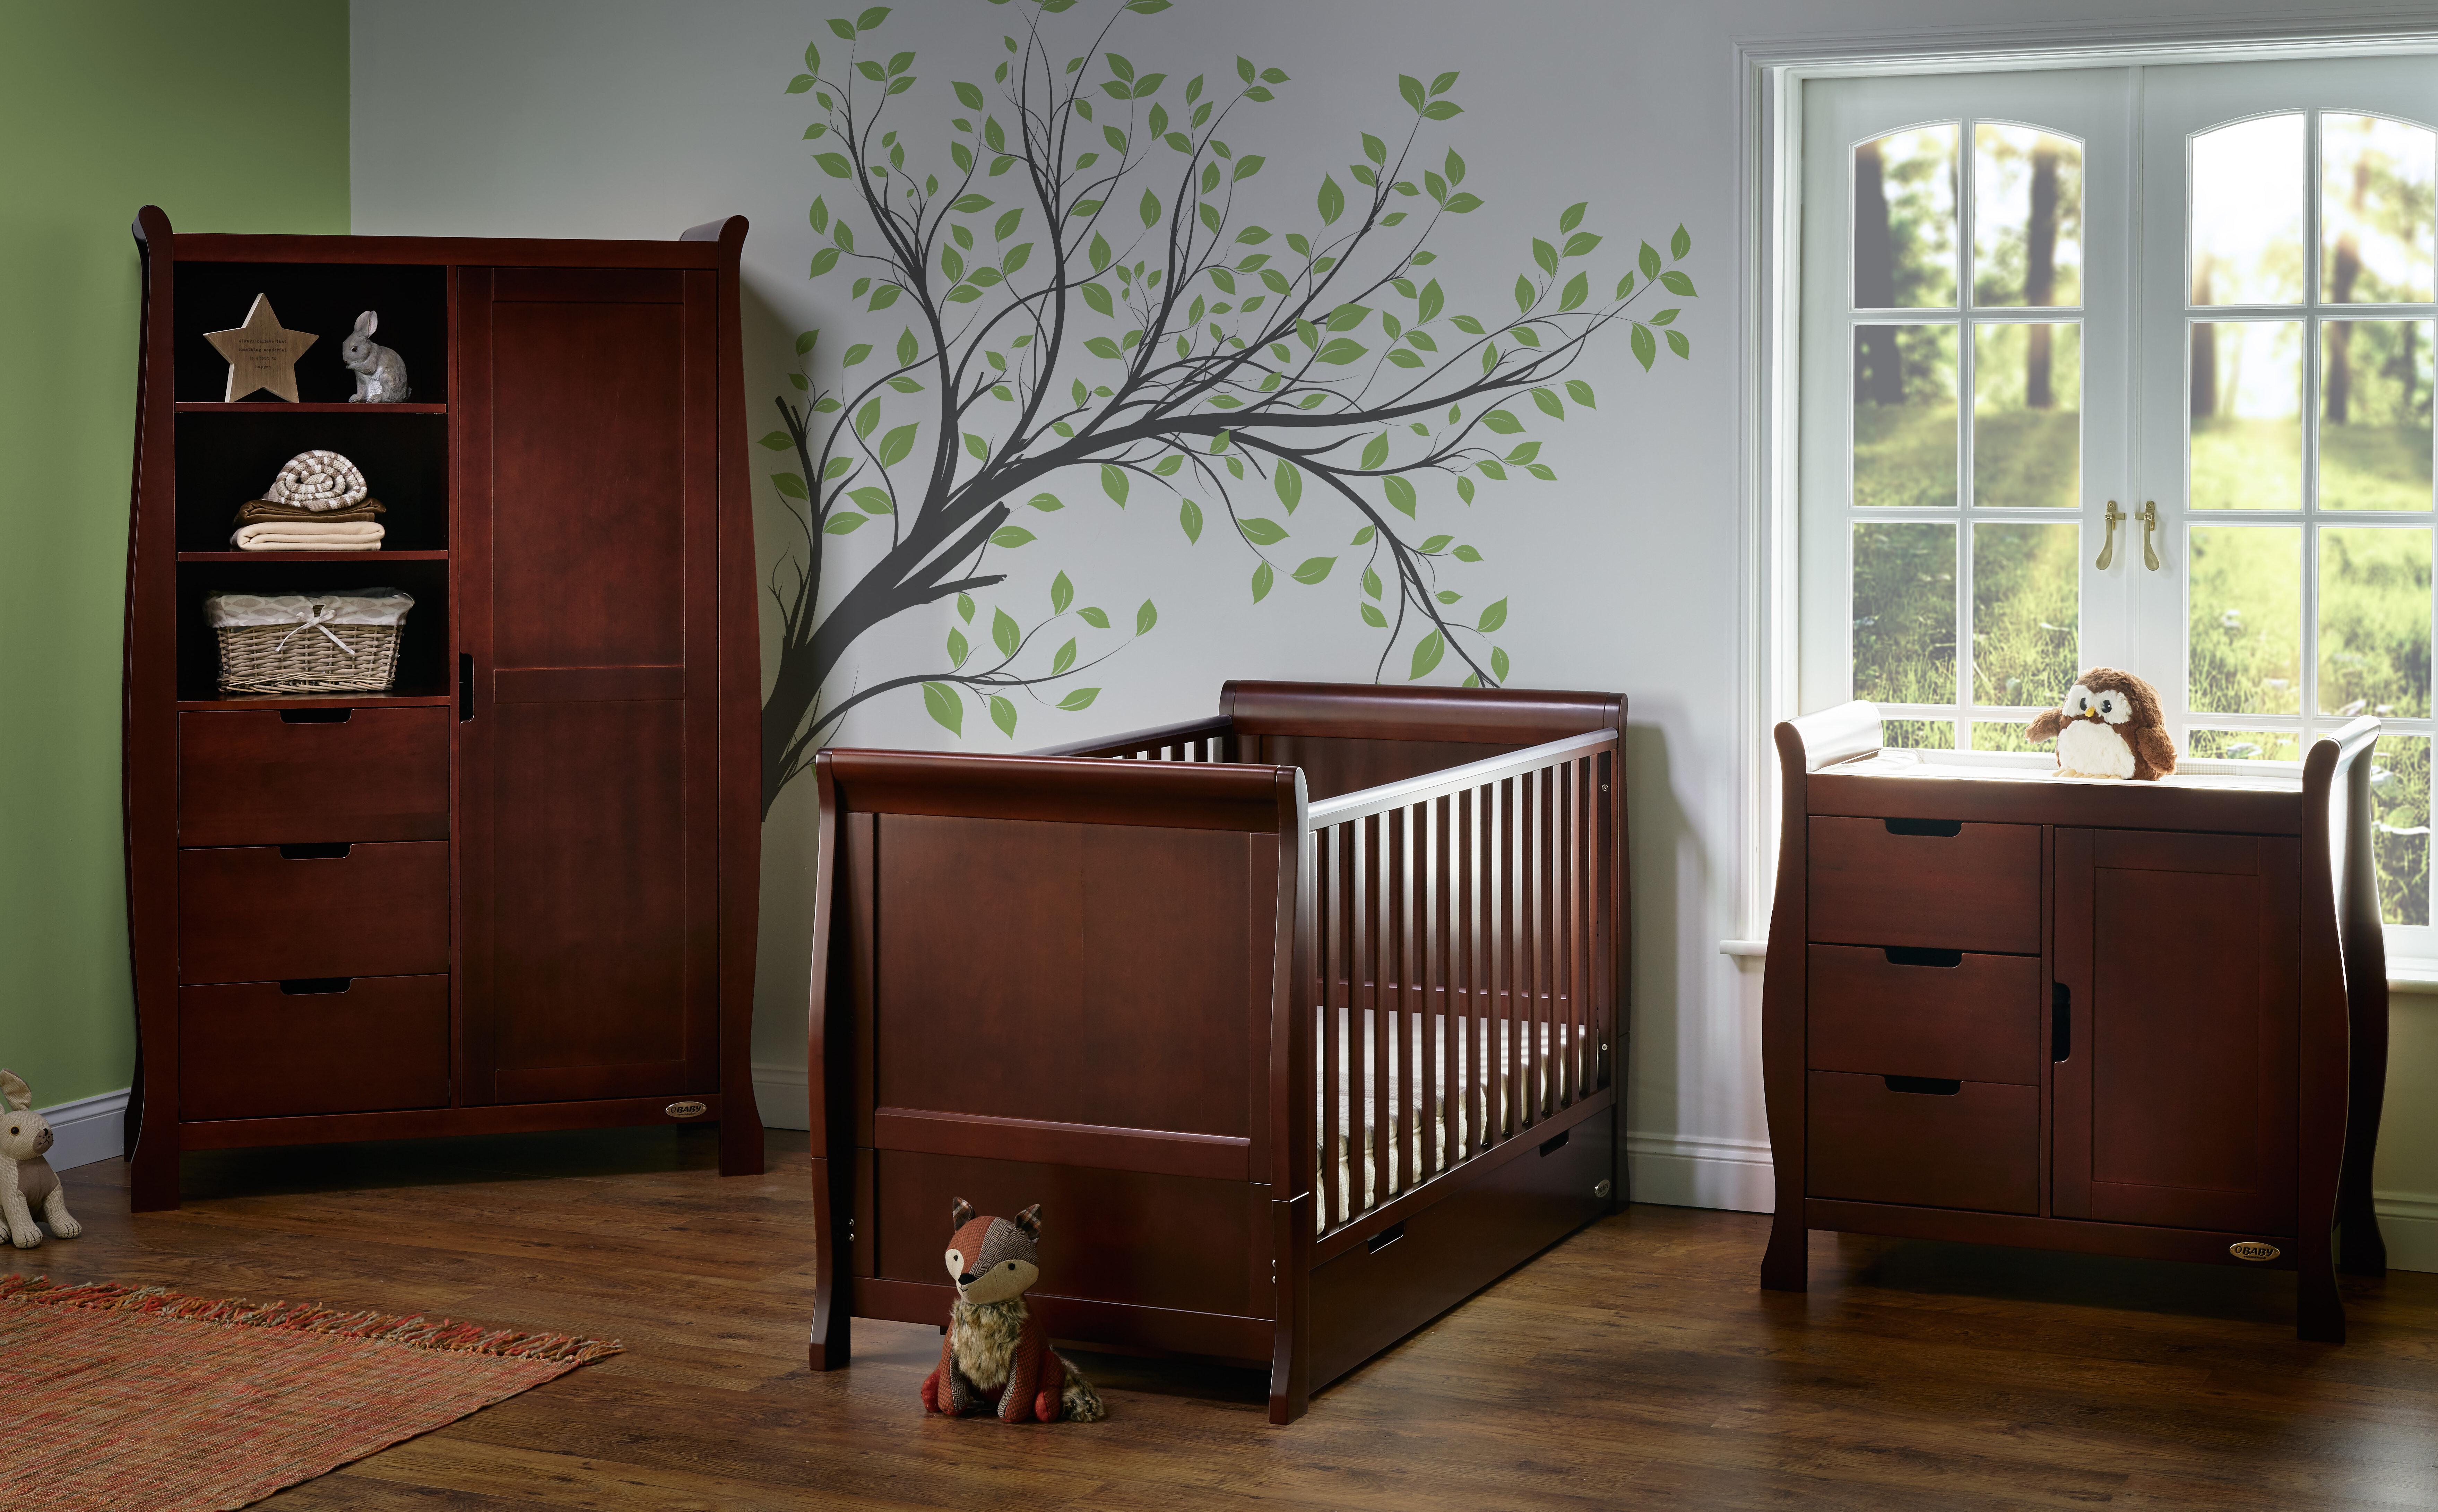 Obaby Stamford Clic Sleigh 3 Piece Nursery Furniture Set Wayfair Co Uk